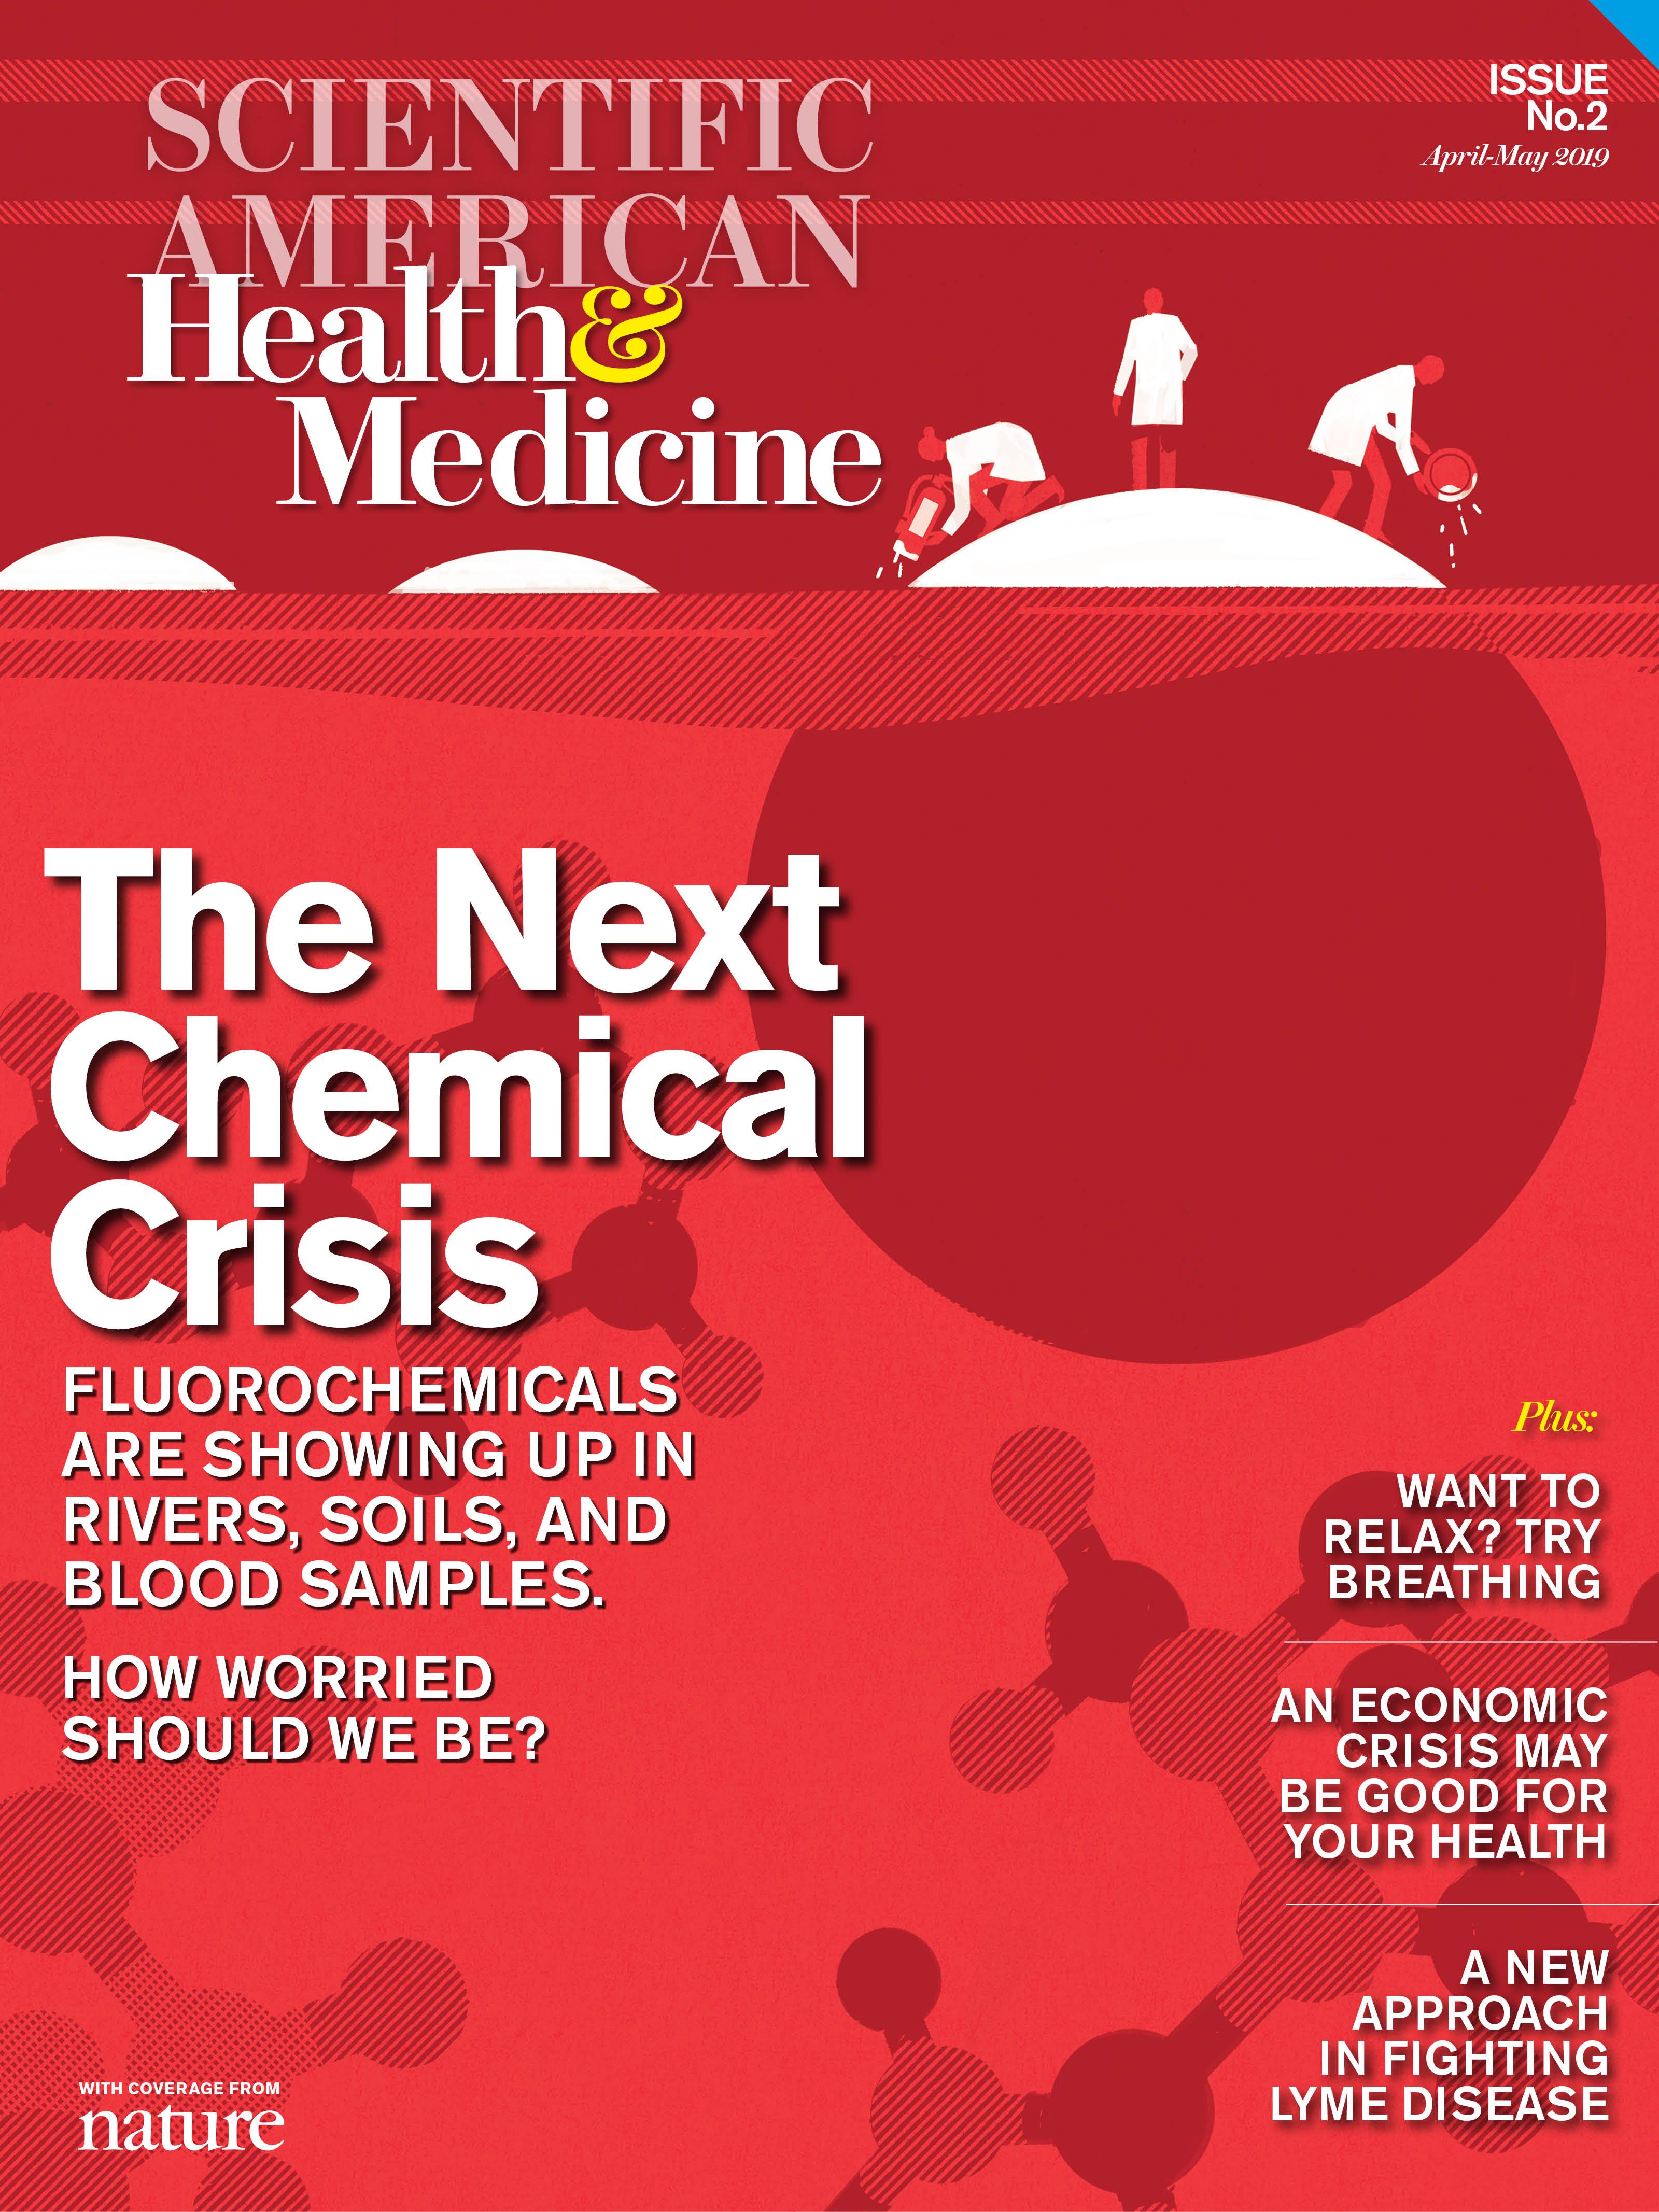 Scientific American Health & Medicine, Volume 1, Issue 2